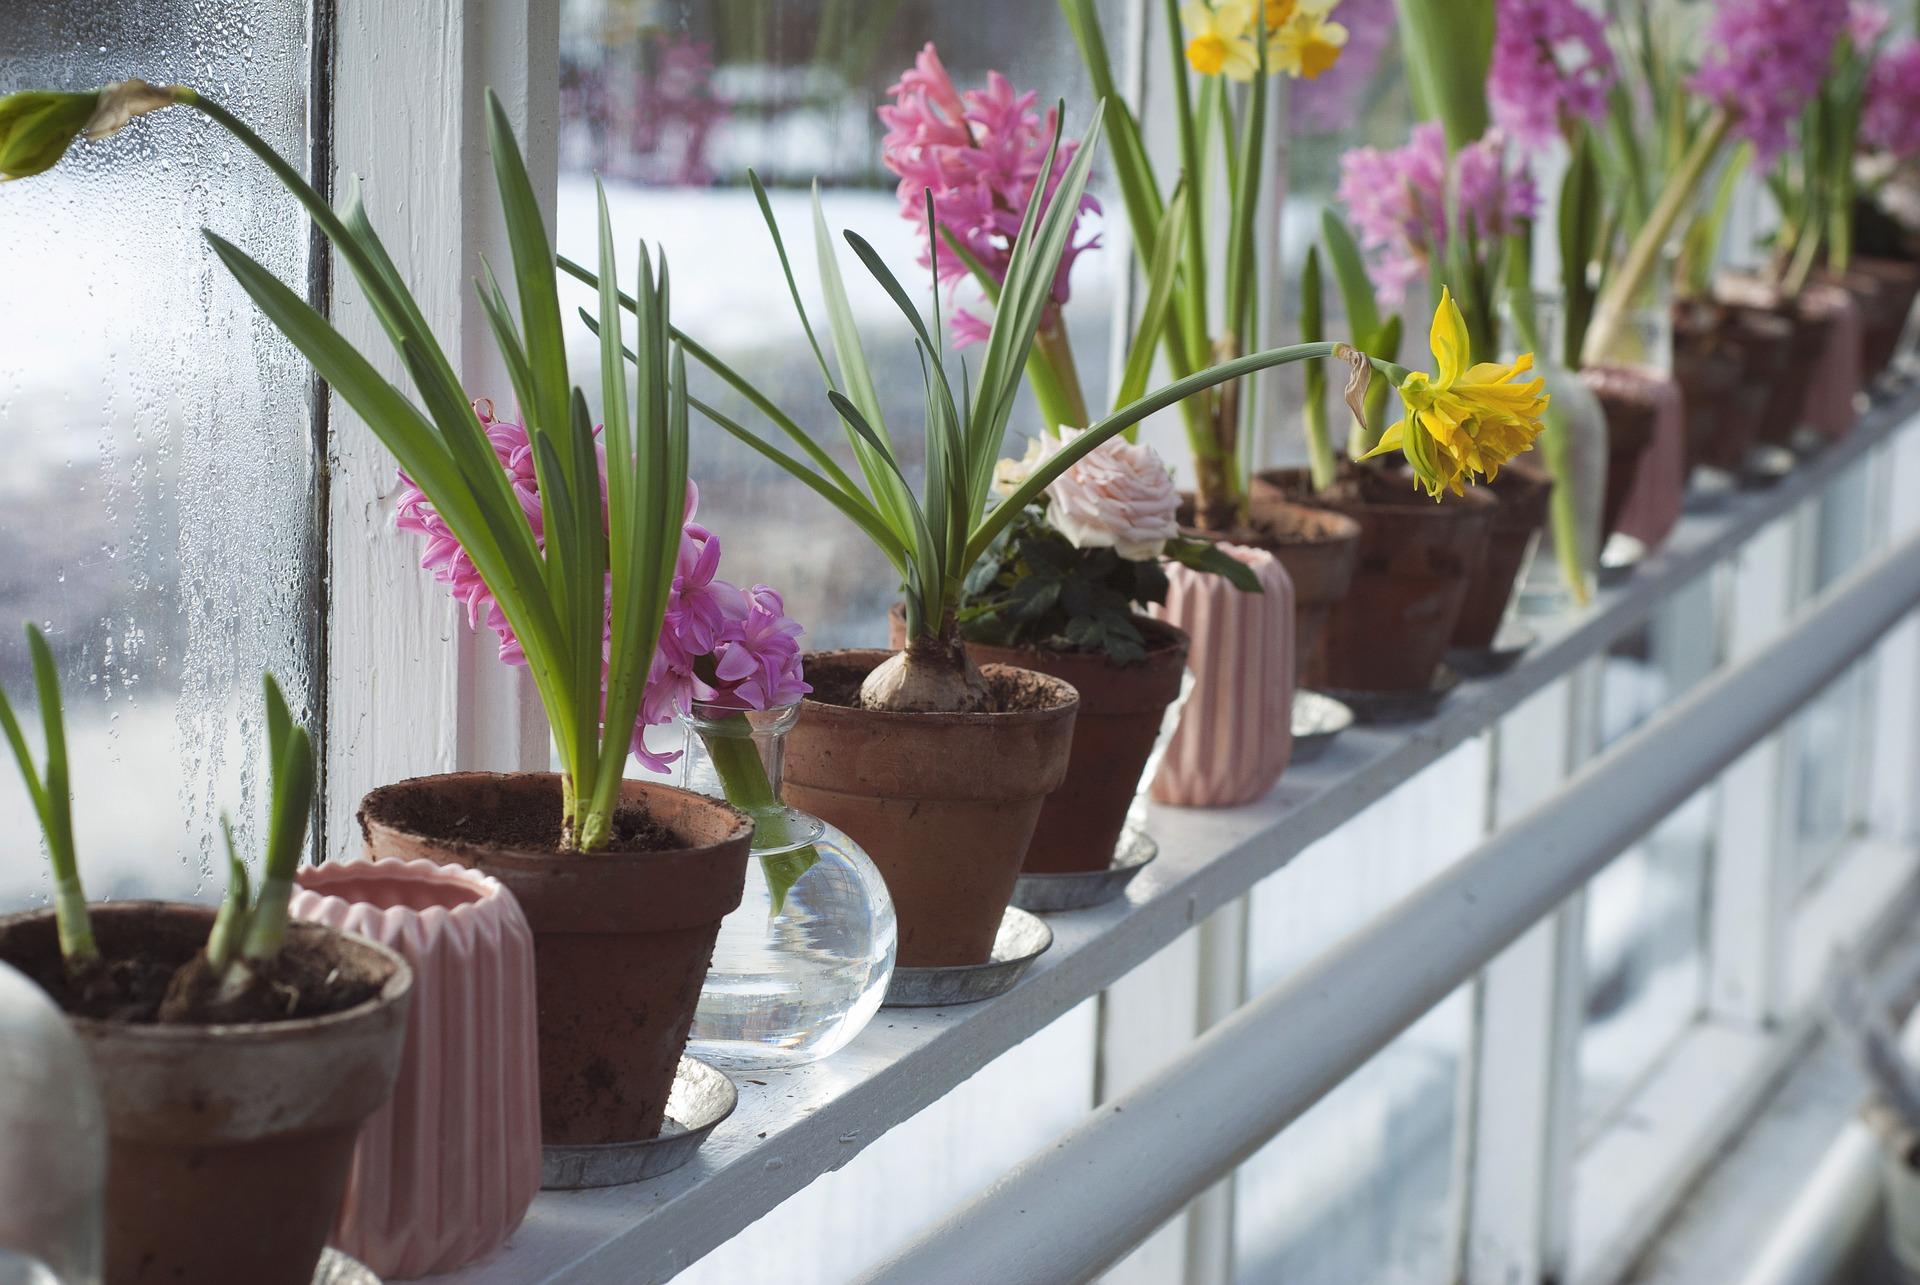 flower-bulbs-indoors.jpg